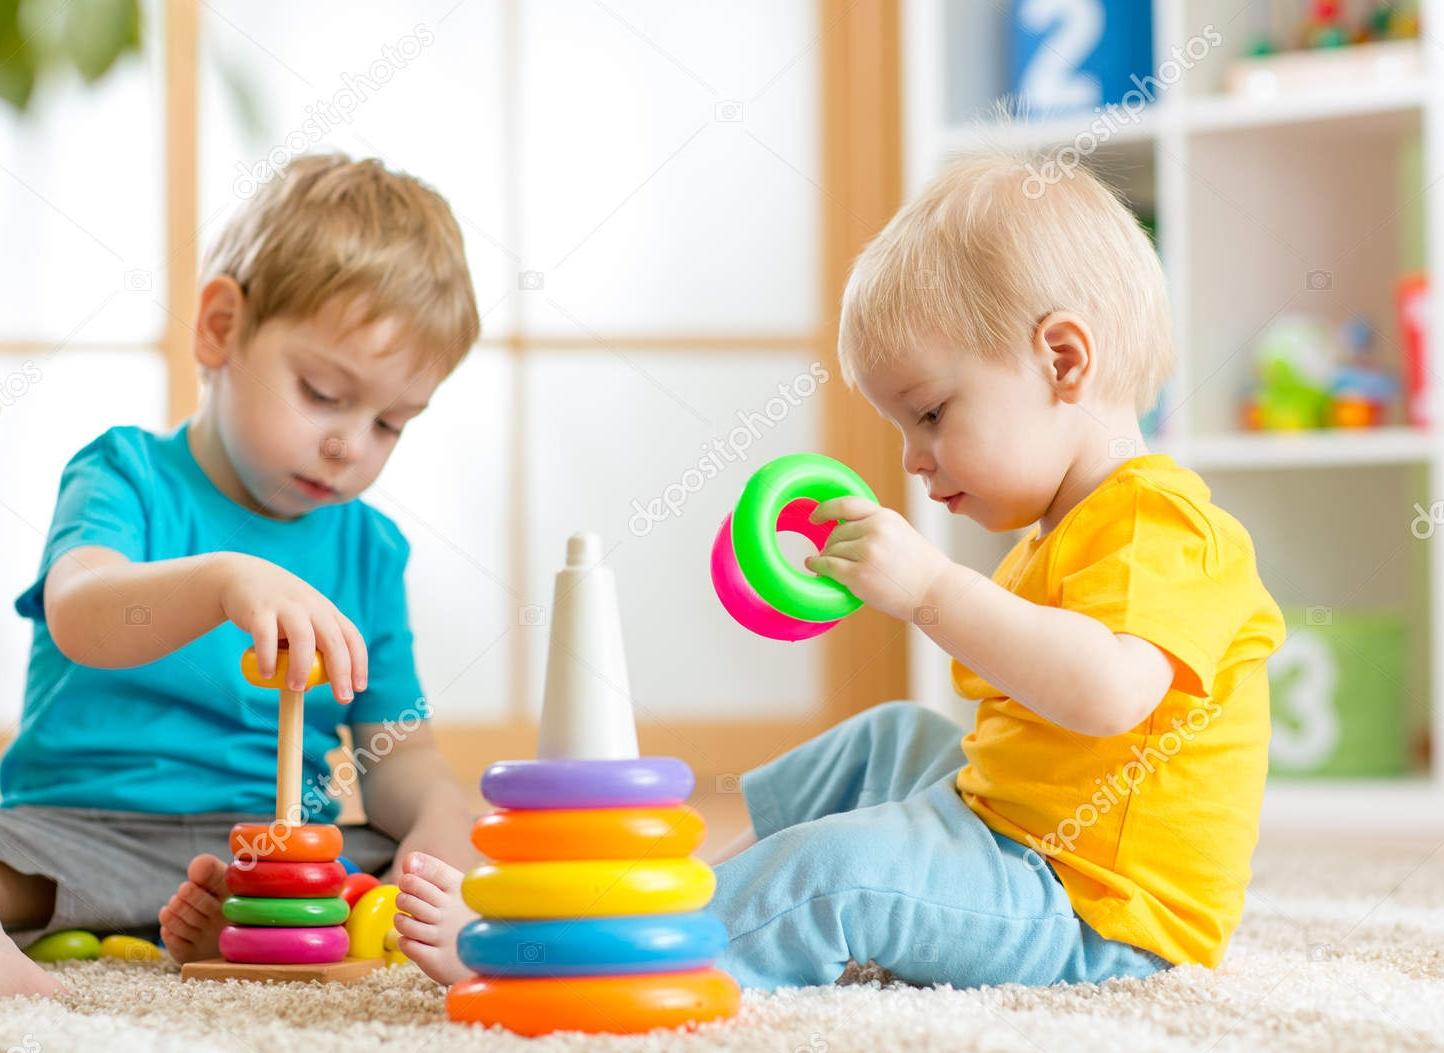 depositphotos_138861758-stock-photo-children-playing-together-toddler-kid.jpg